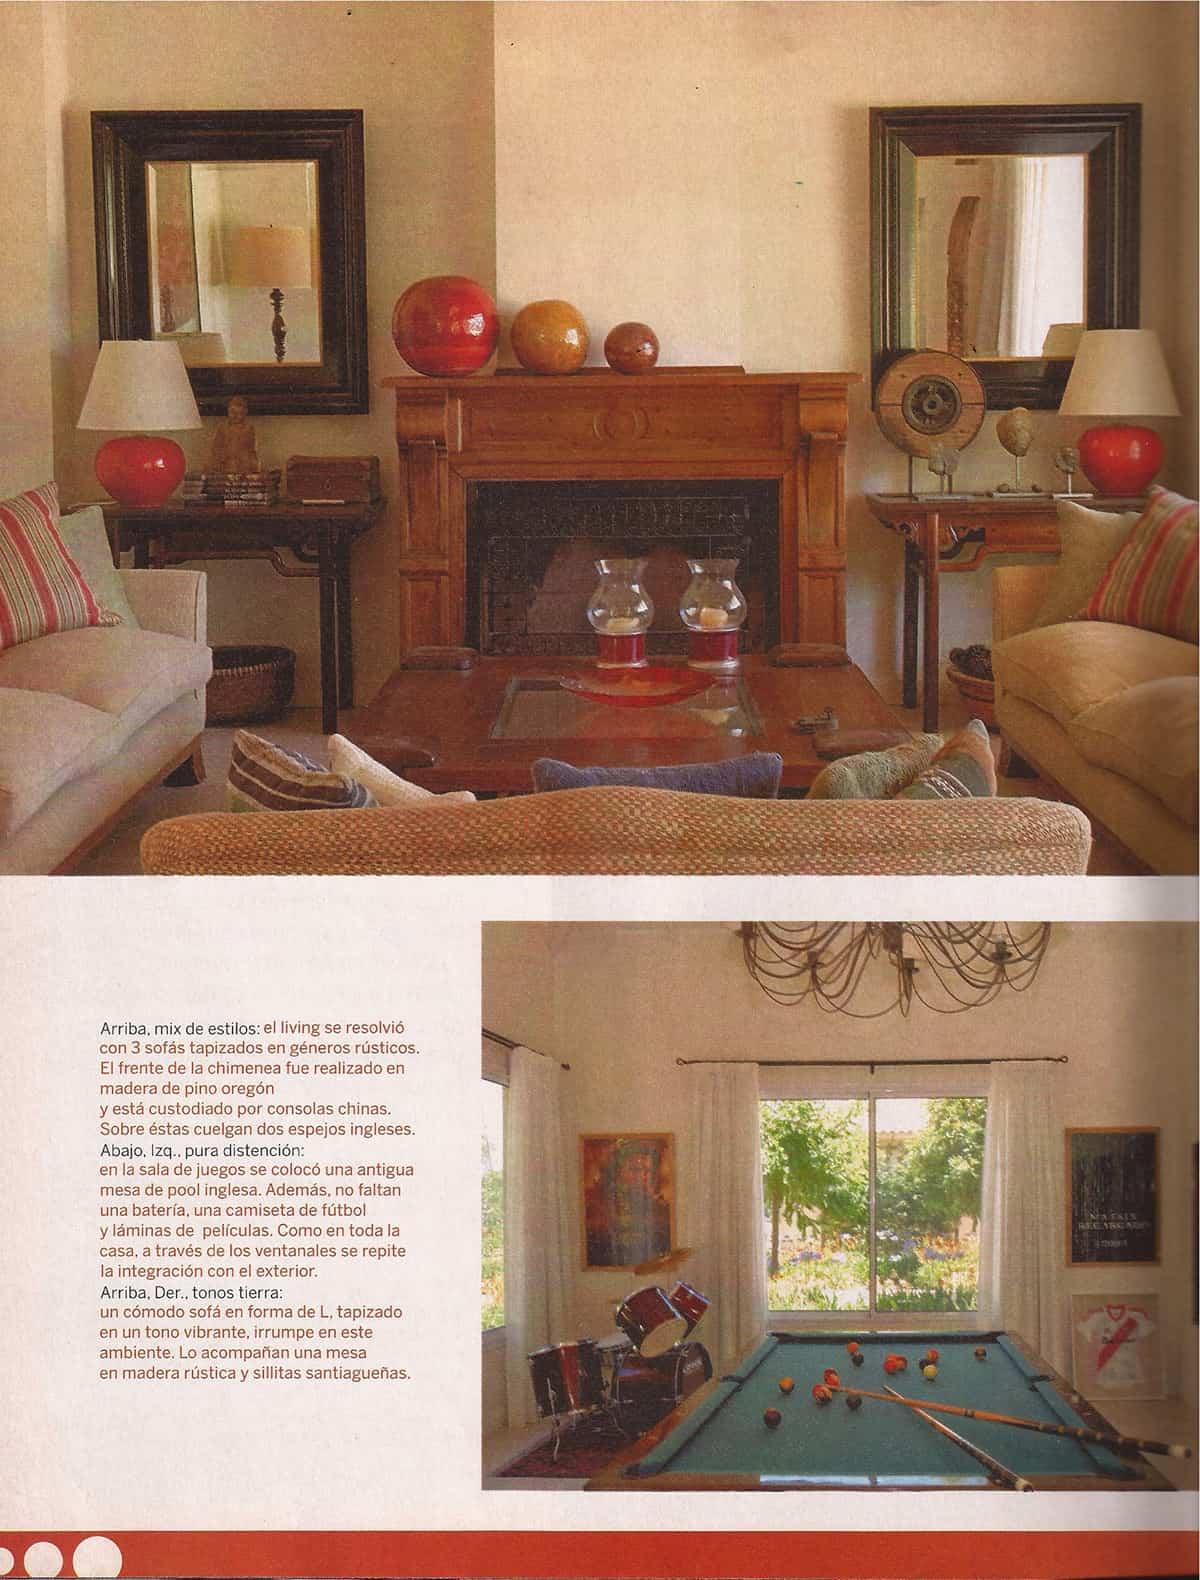 La Nacion Revista 01-2008 – 04